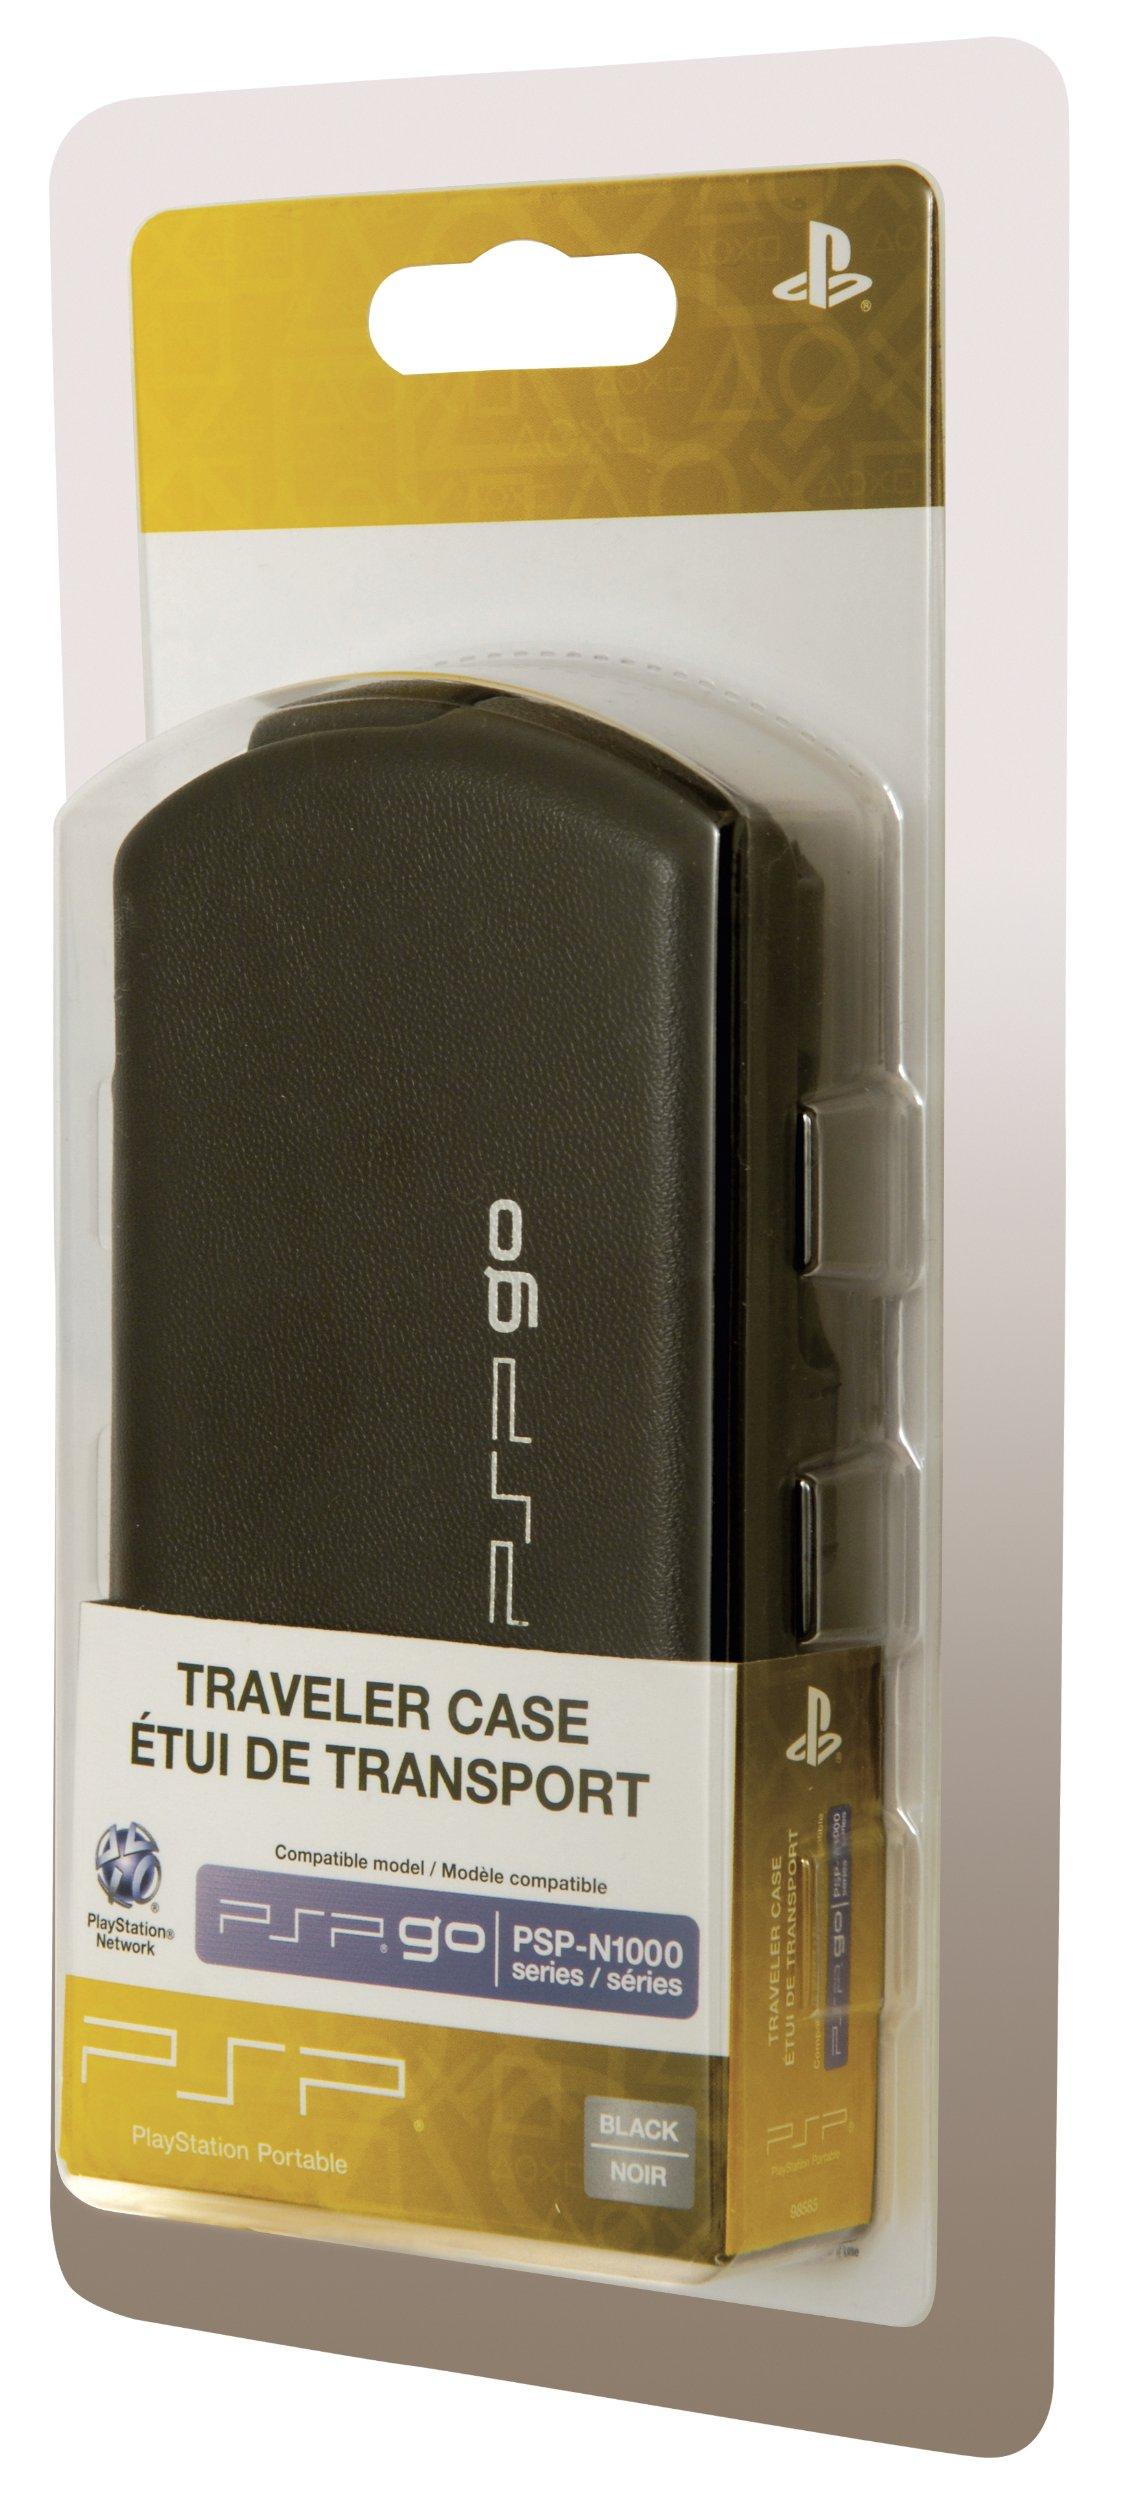 PSPgo Traveler Case - Black